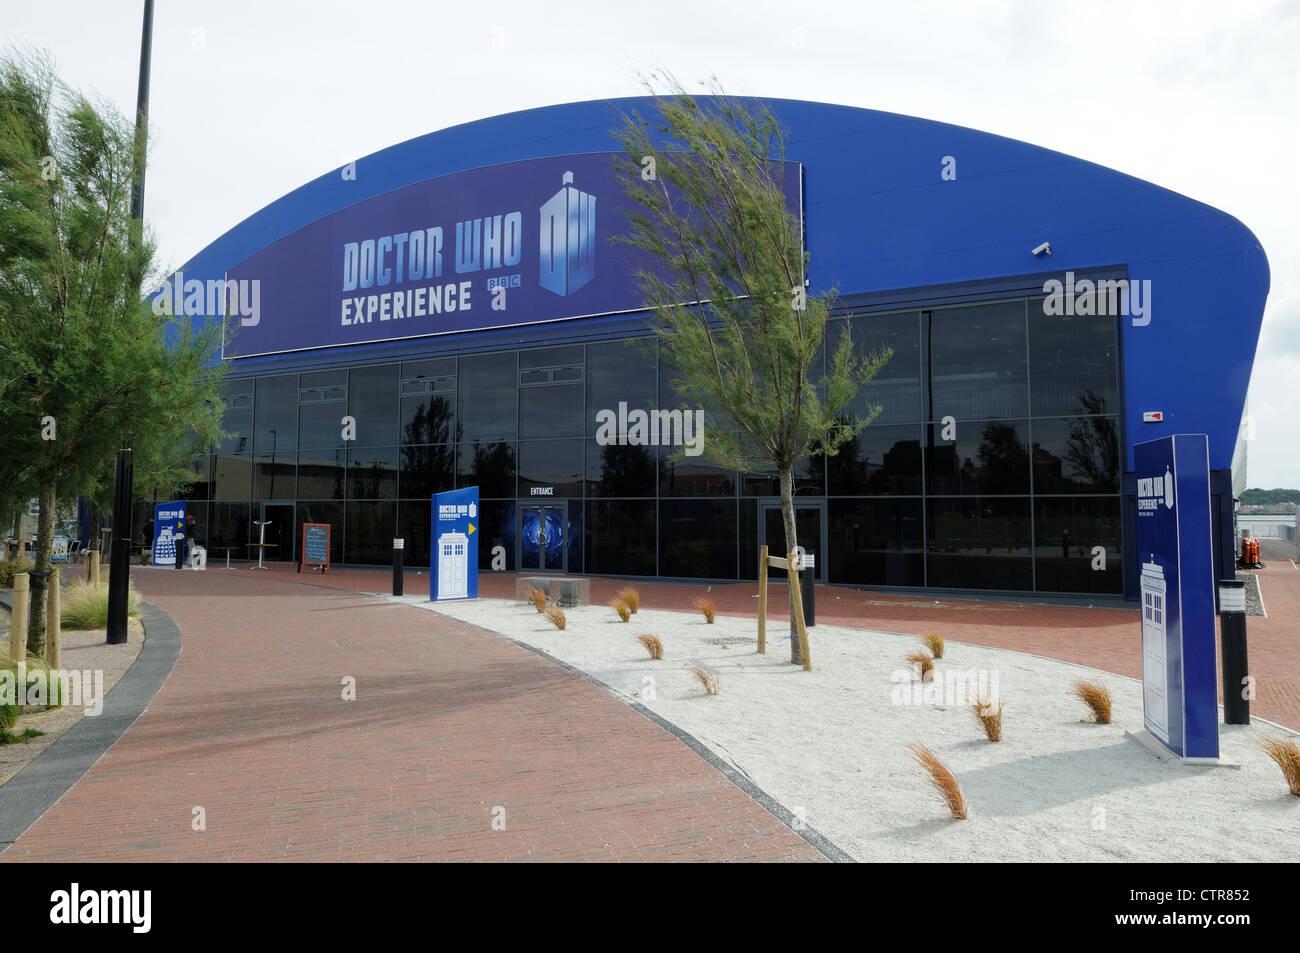 The Doctor Who Experience Building Porth Teigr Cardiff Bay Glamorgan Wales Cymru UK GB - Stock Image